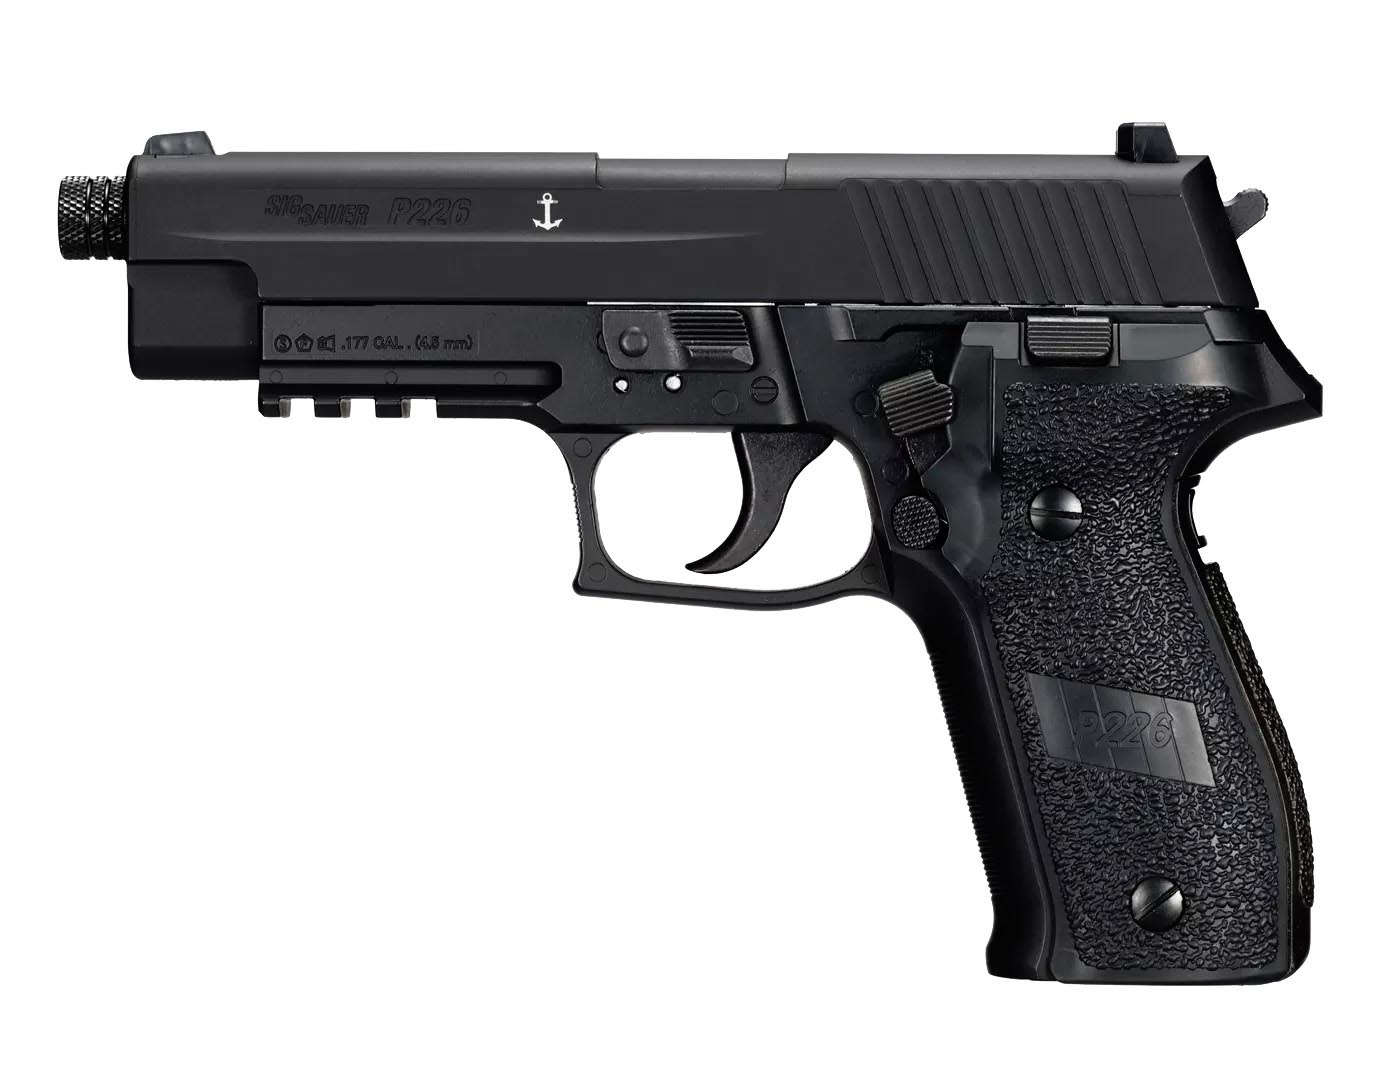 SIG Sauer P226 Pellet Pistol, Black